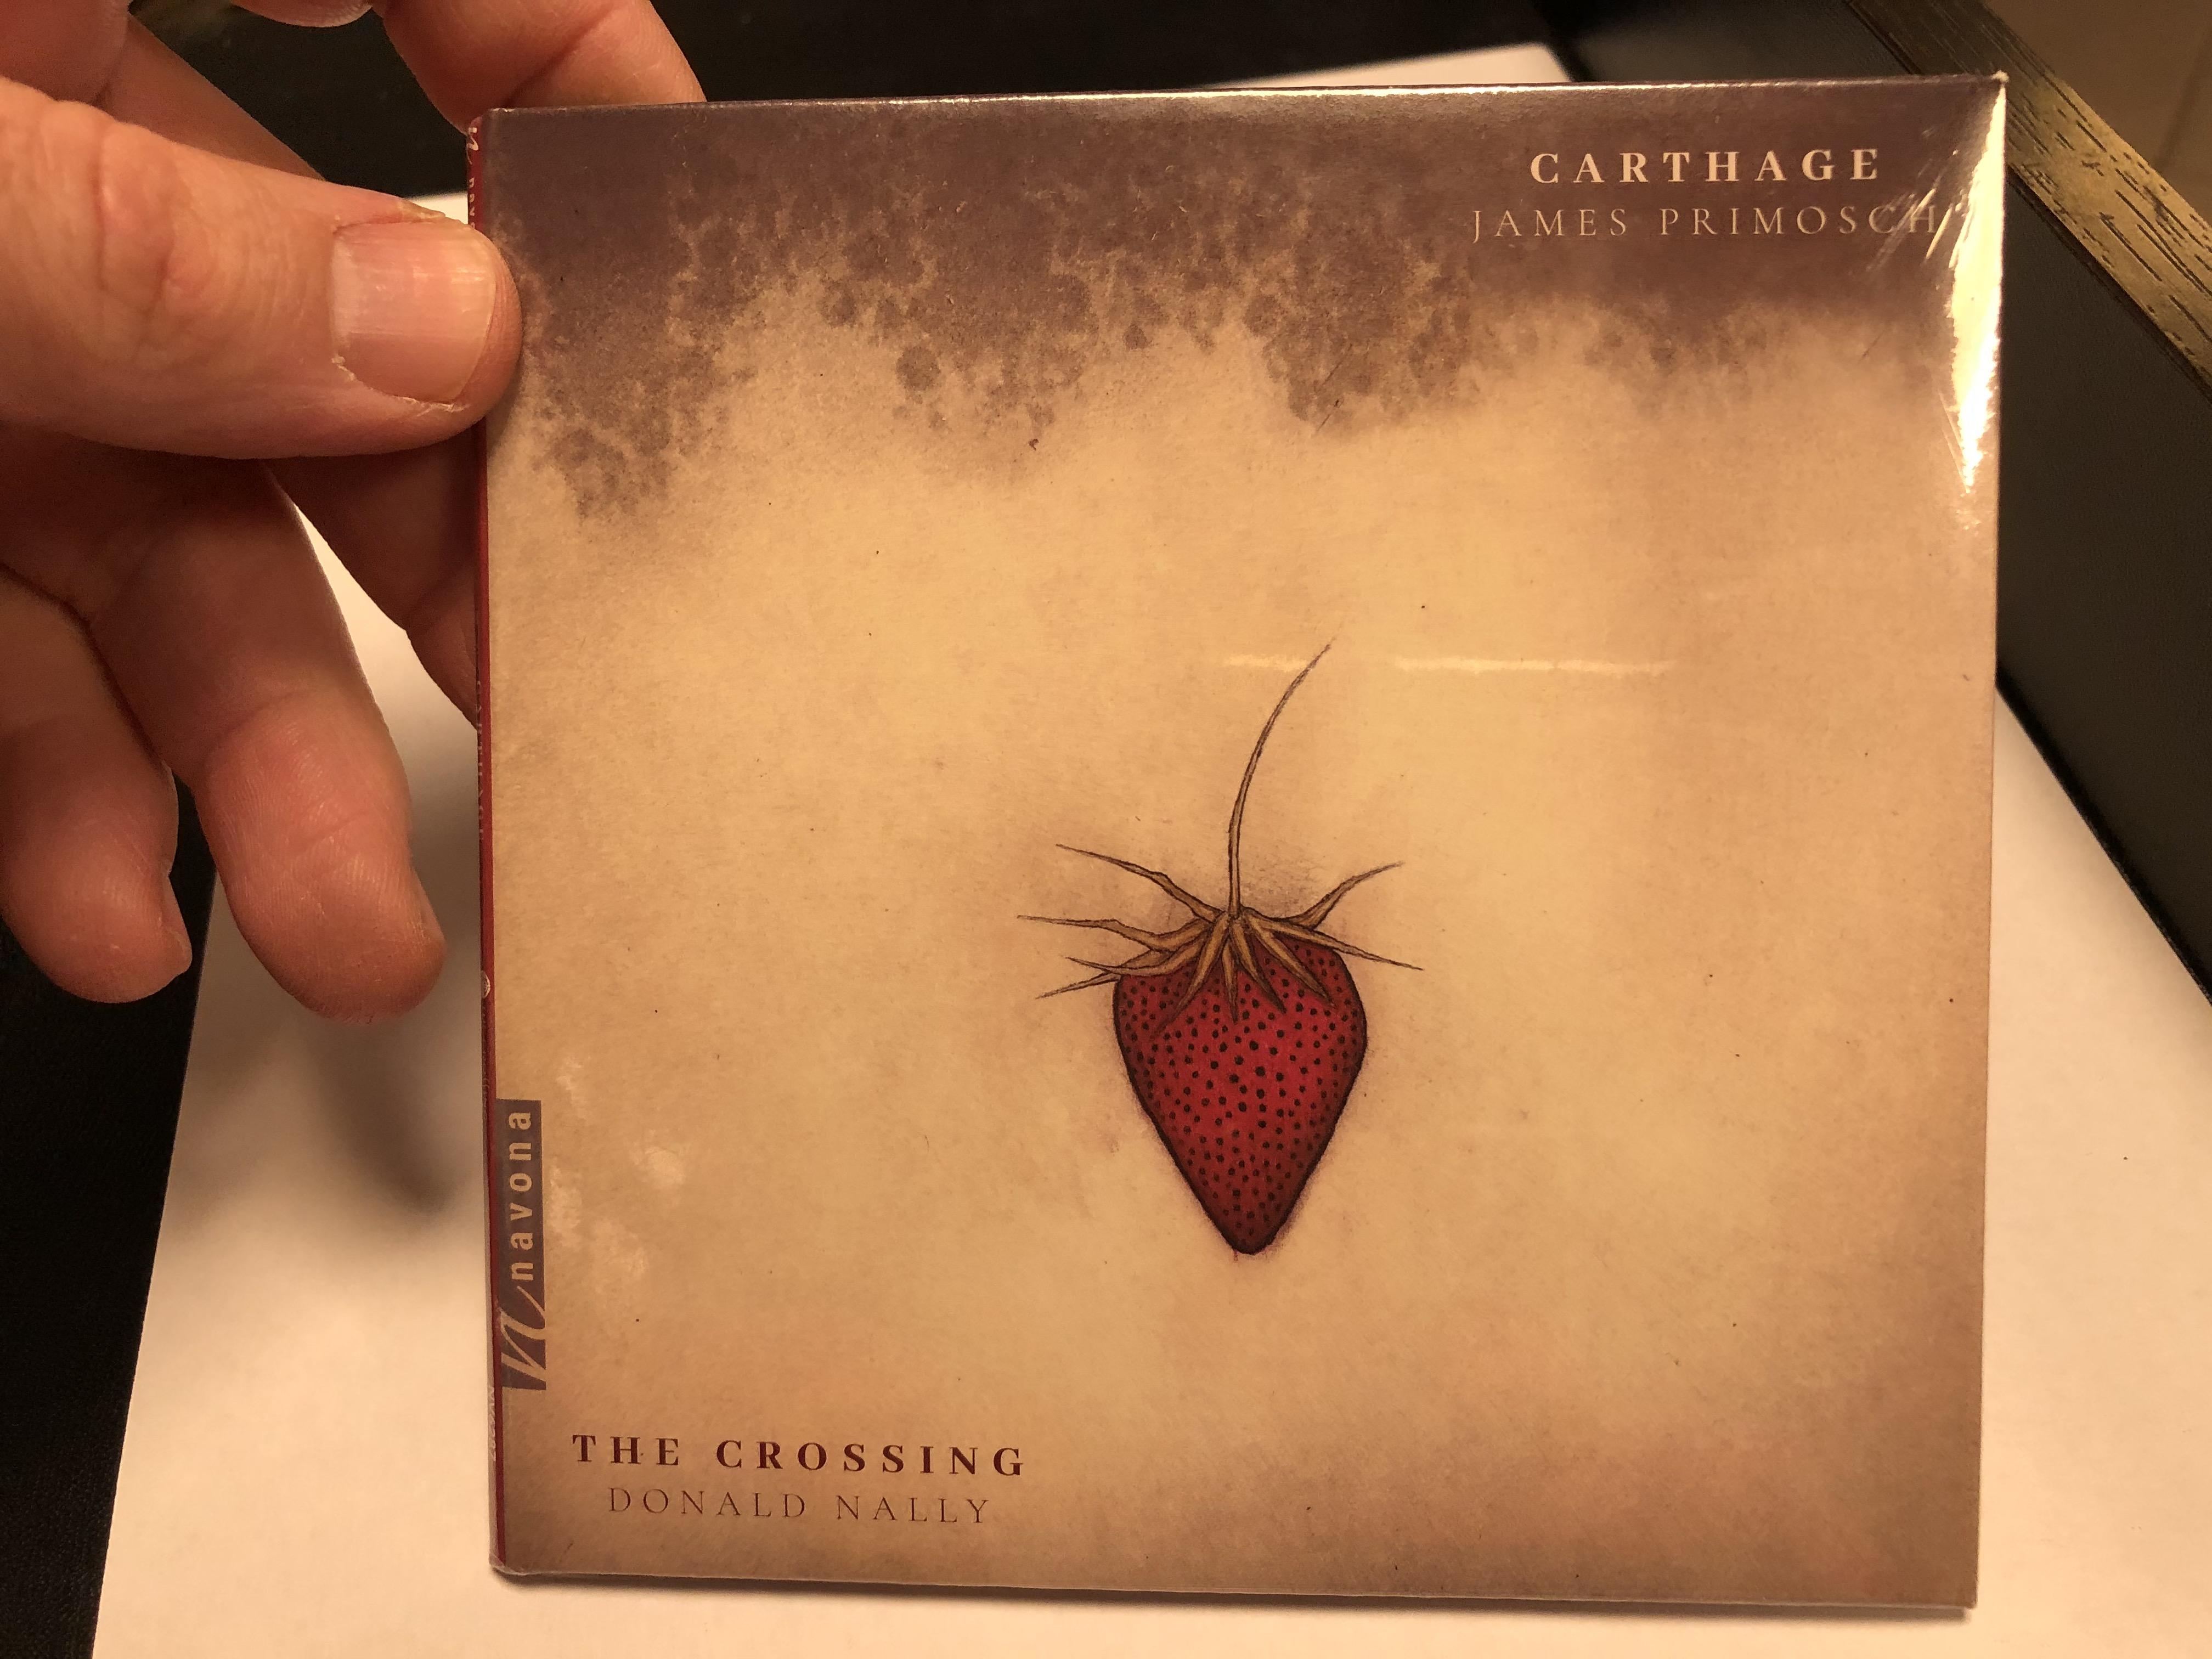 carthage-james-primosch-the-crossing-donald-nally-navona-records-audio-cd-2020-nv6287-1-.jpg